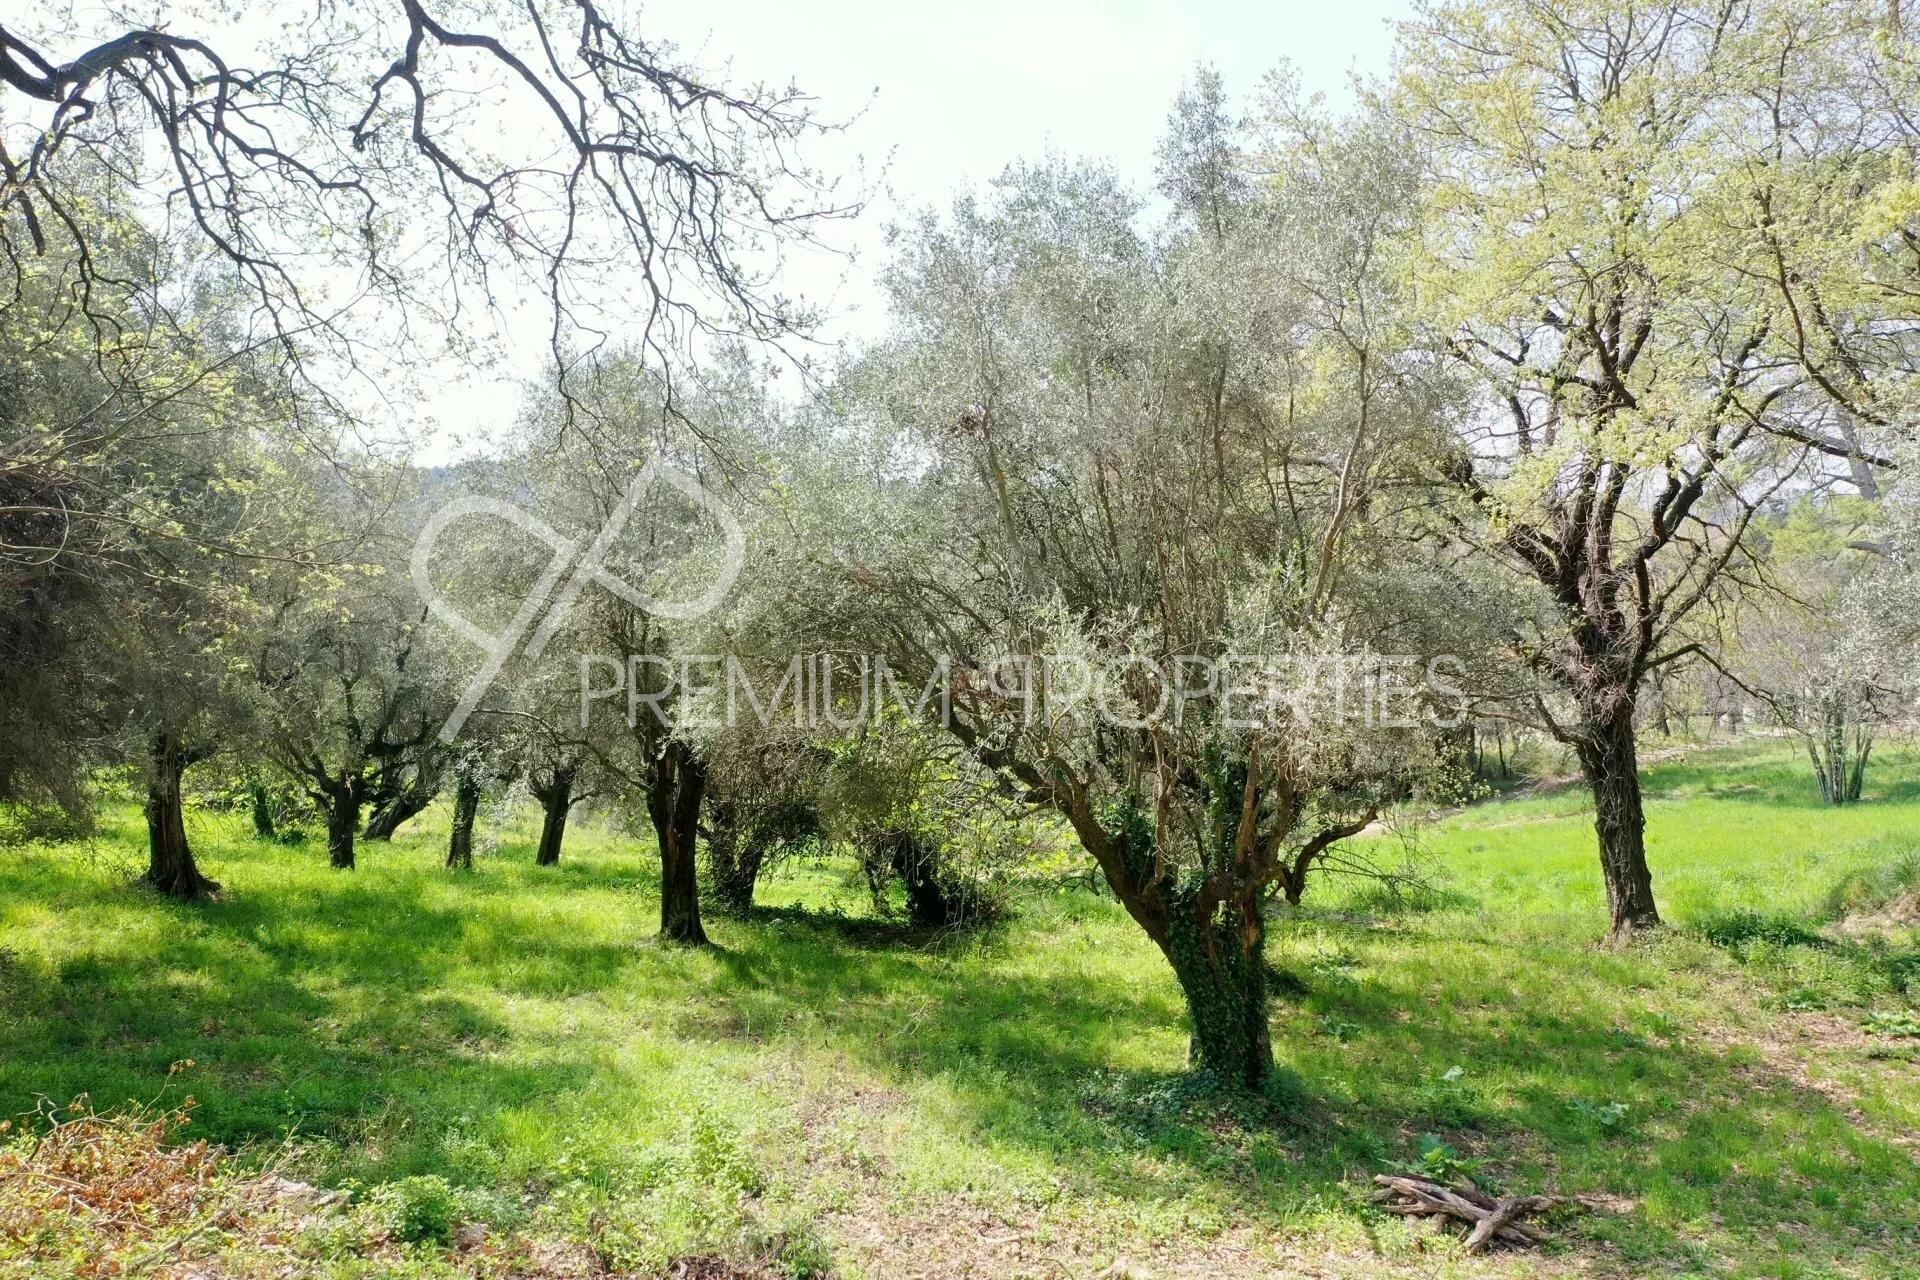 Land in Opio, Provence-Alpes-Côte d'Azur, France 1